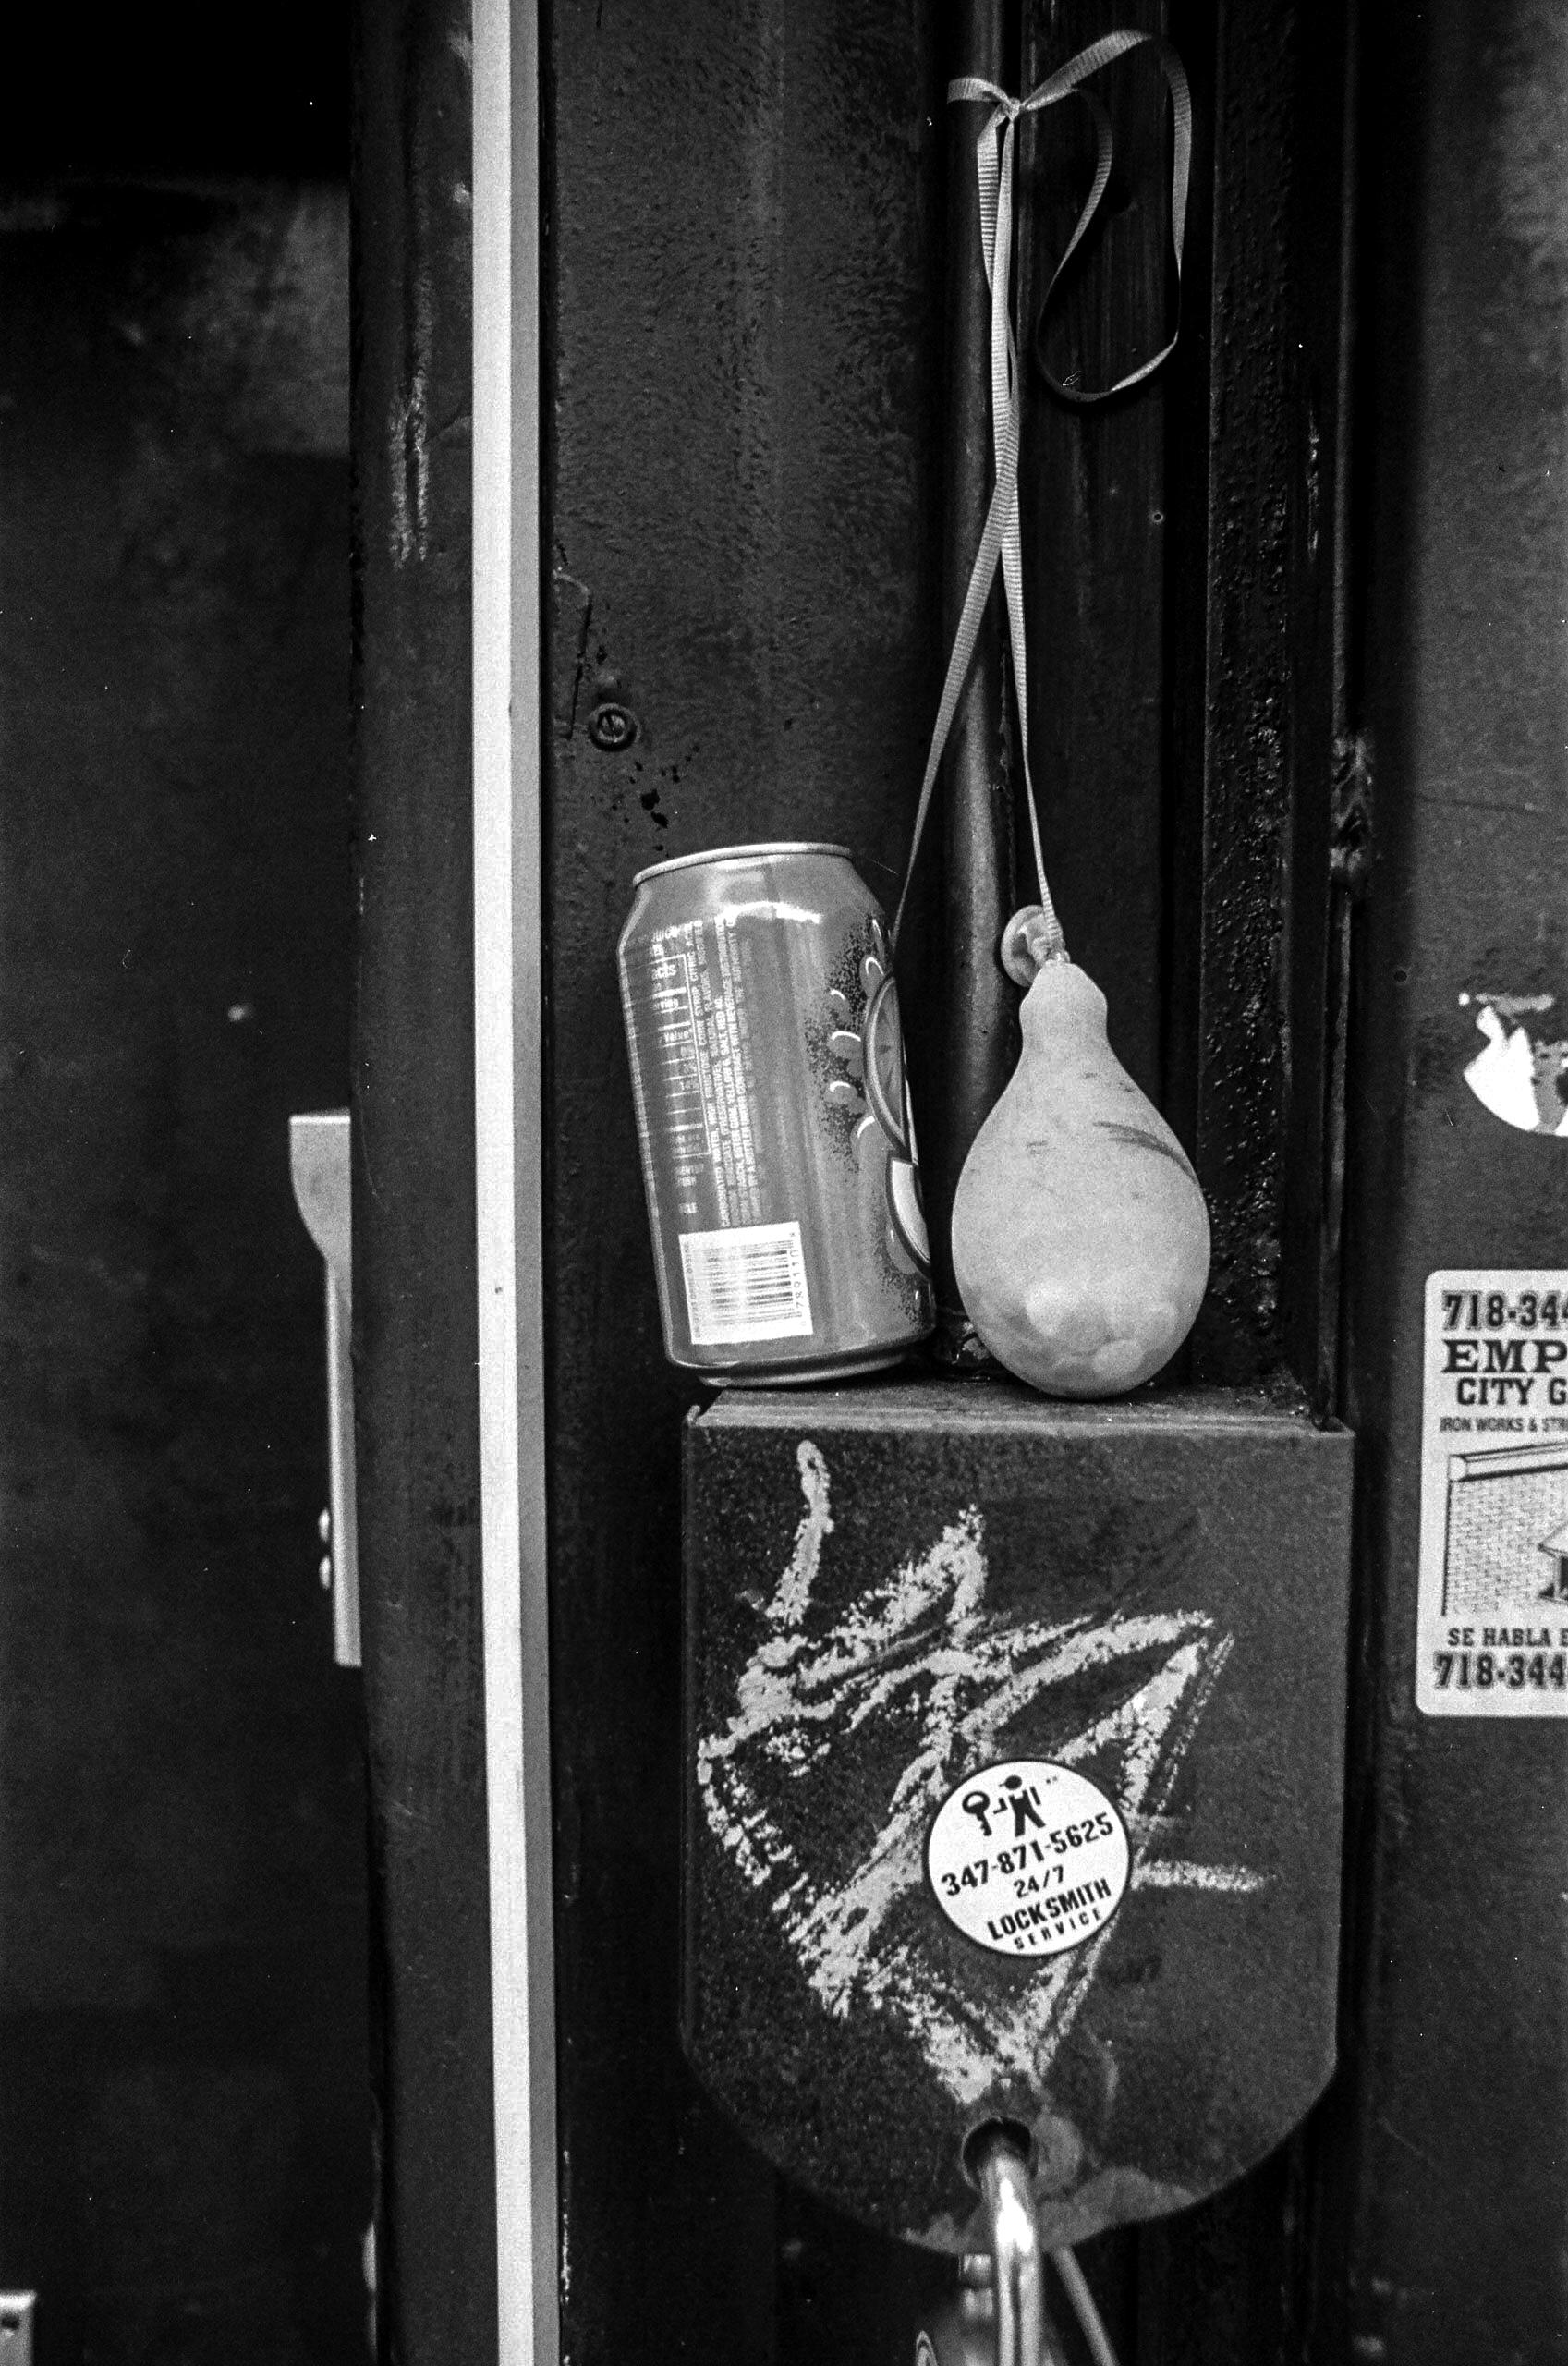 Ballon and Can, Flatbush, Brooklyn_Film Photography_NYC_Joe Curry Photography_2018.jpg